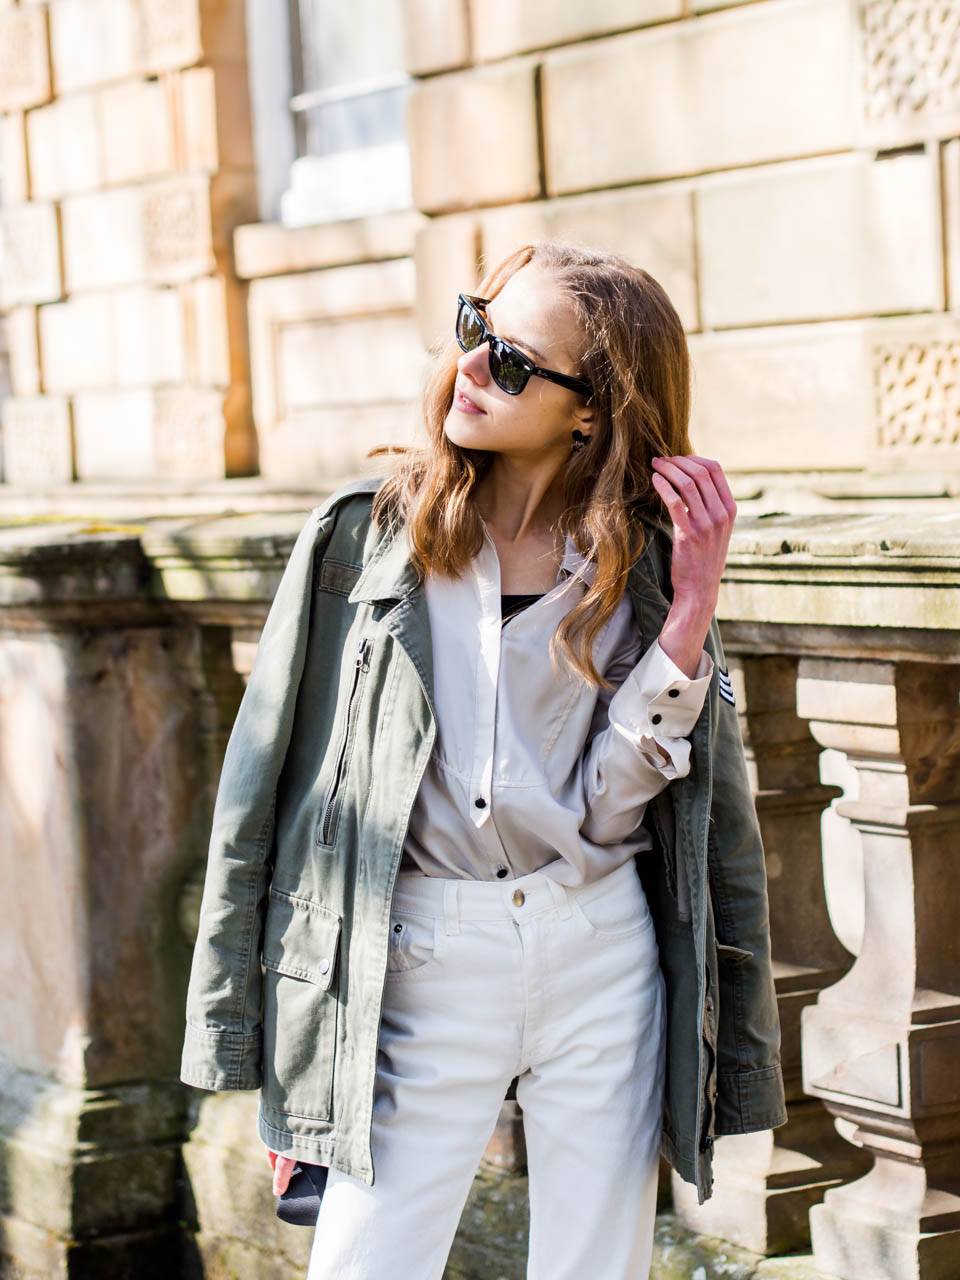 fashion-blogger-spring-outfit-cargo-jacket-white-denim